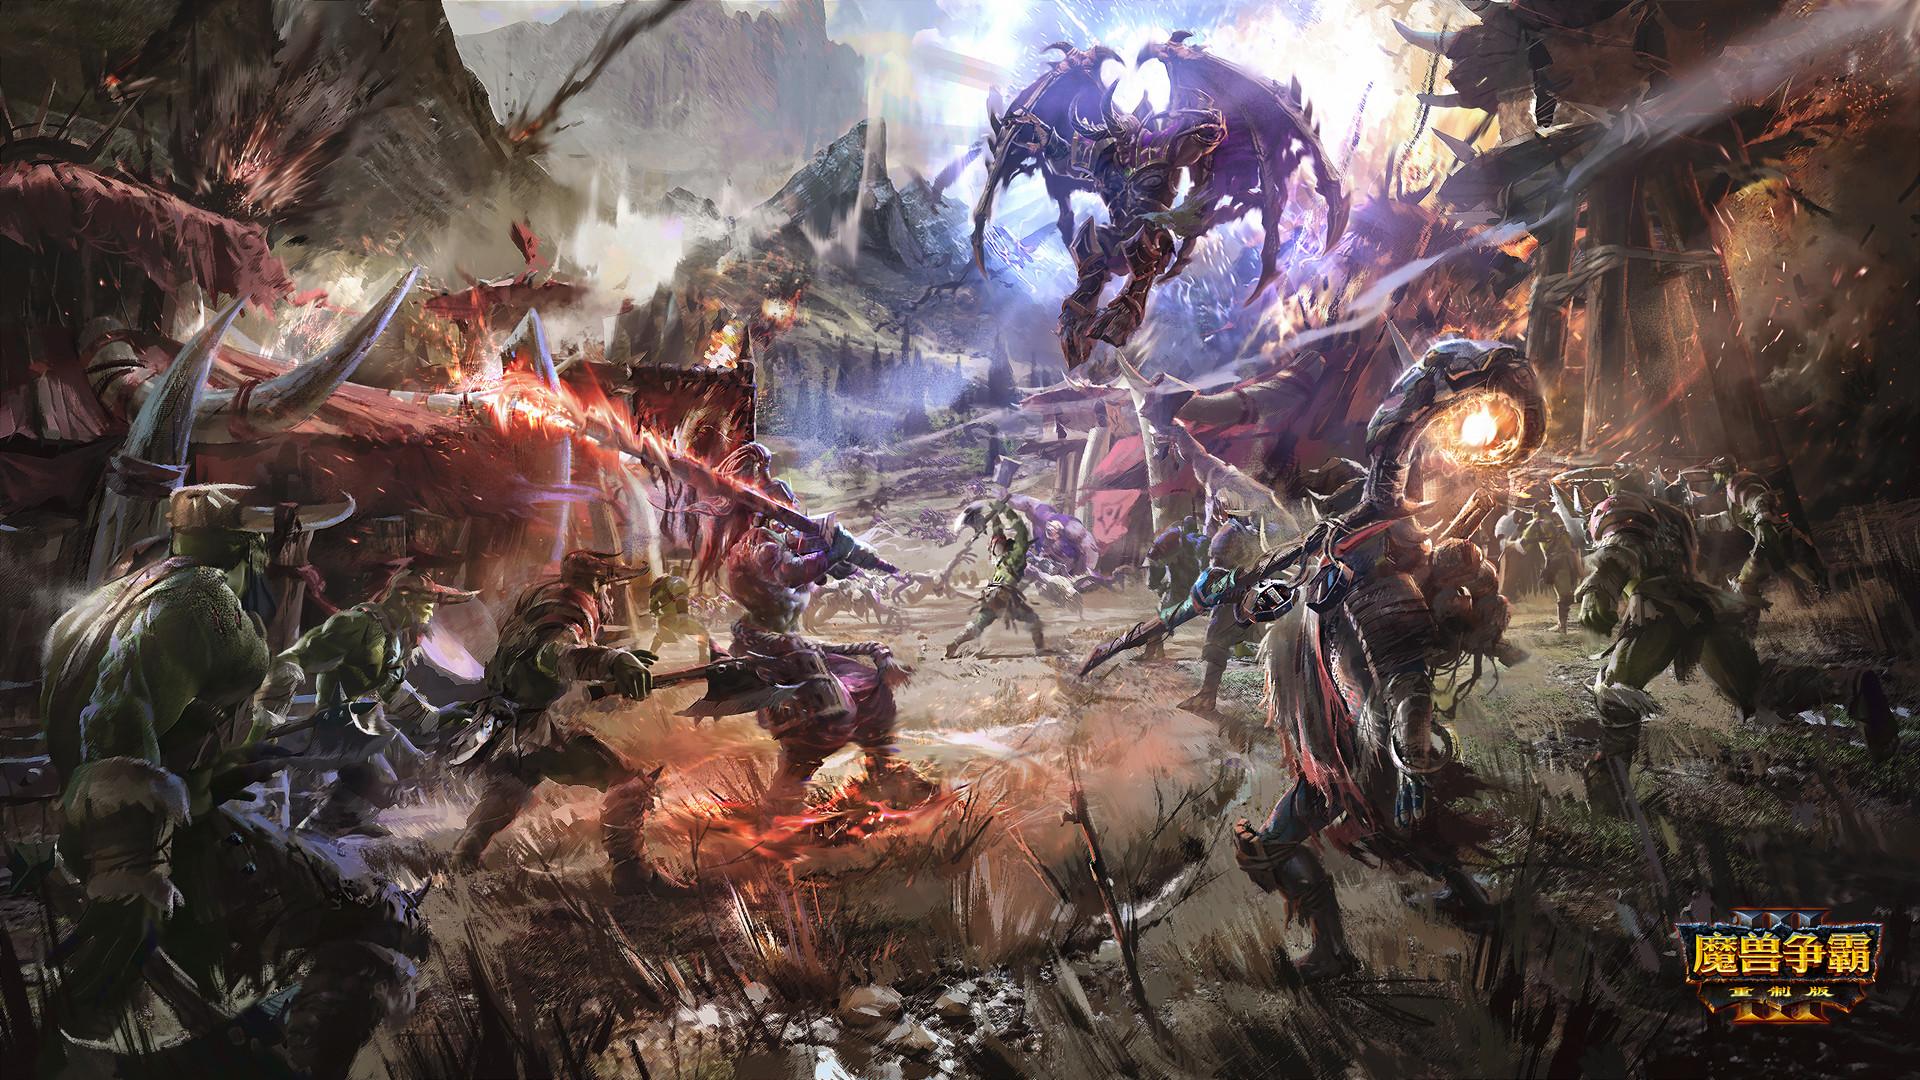 Artstation Poster For Warcraft Iii Reforged Leo Li